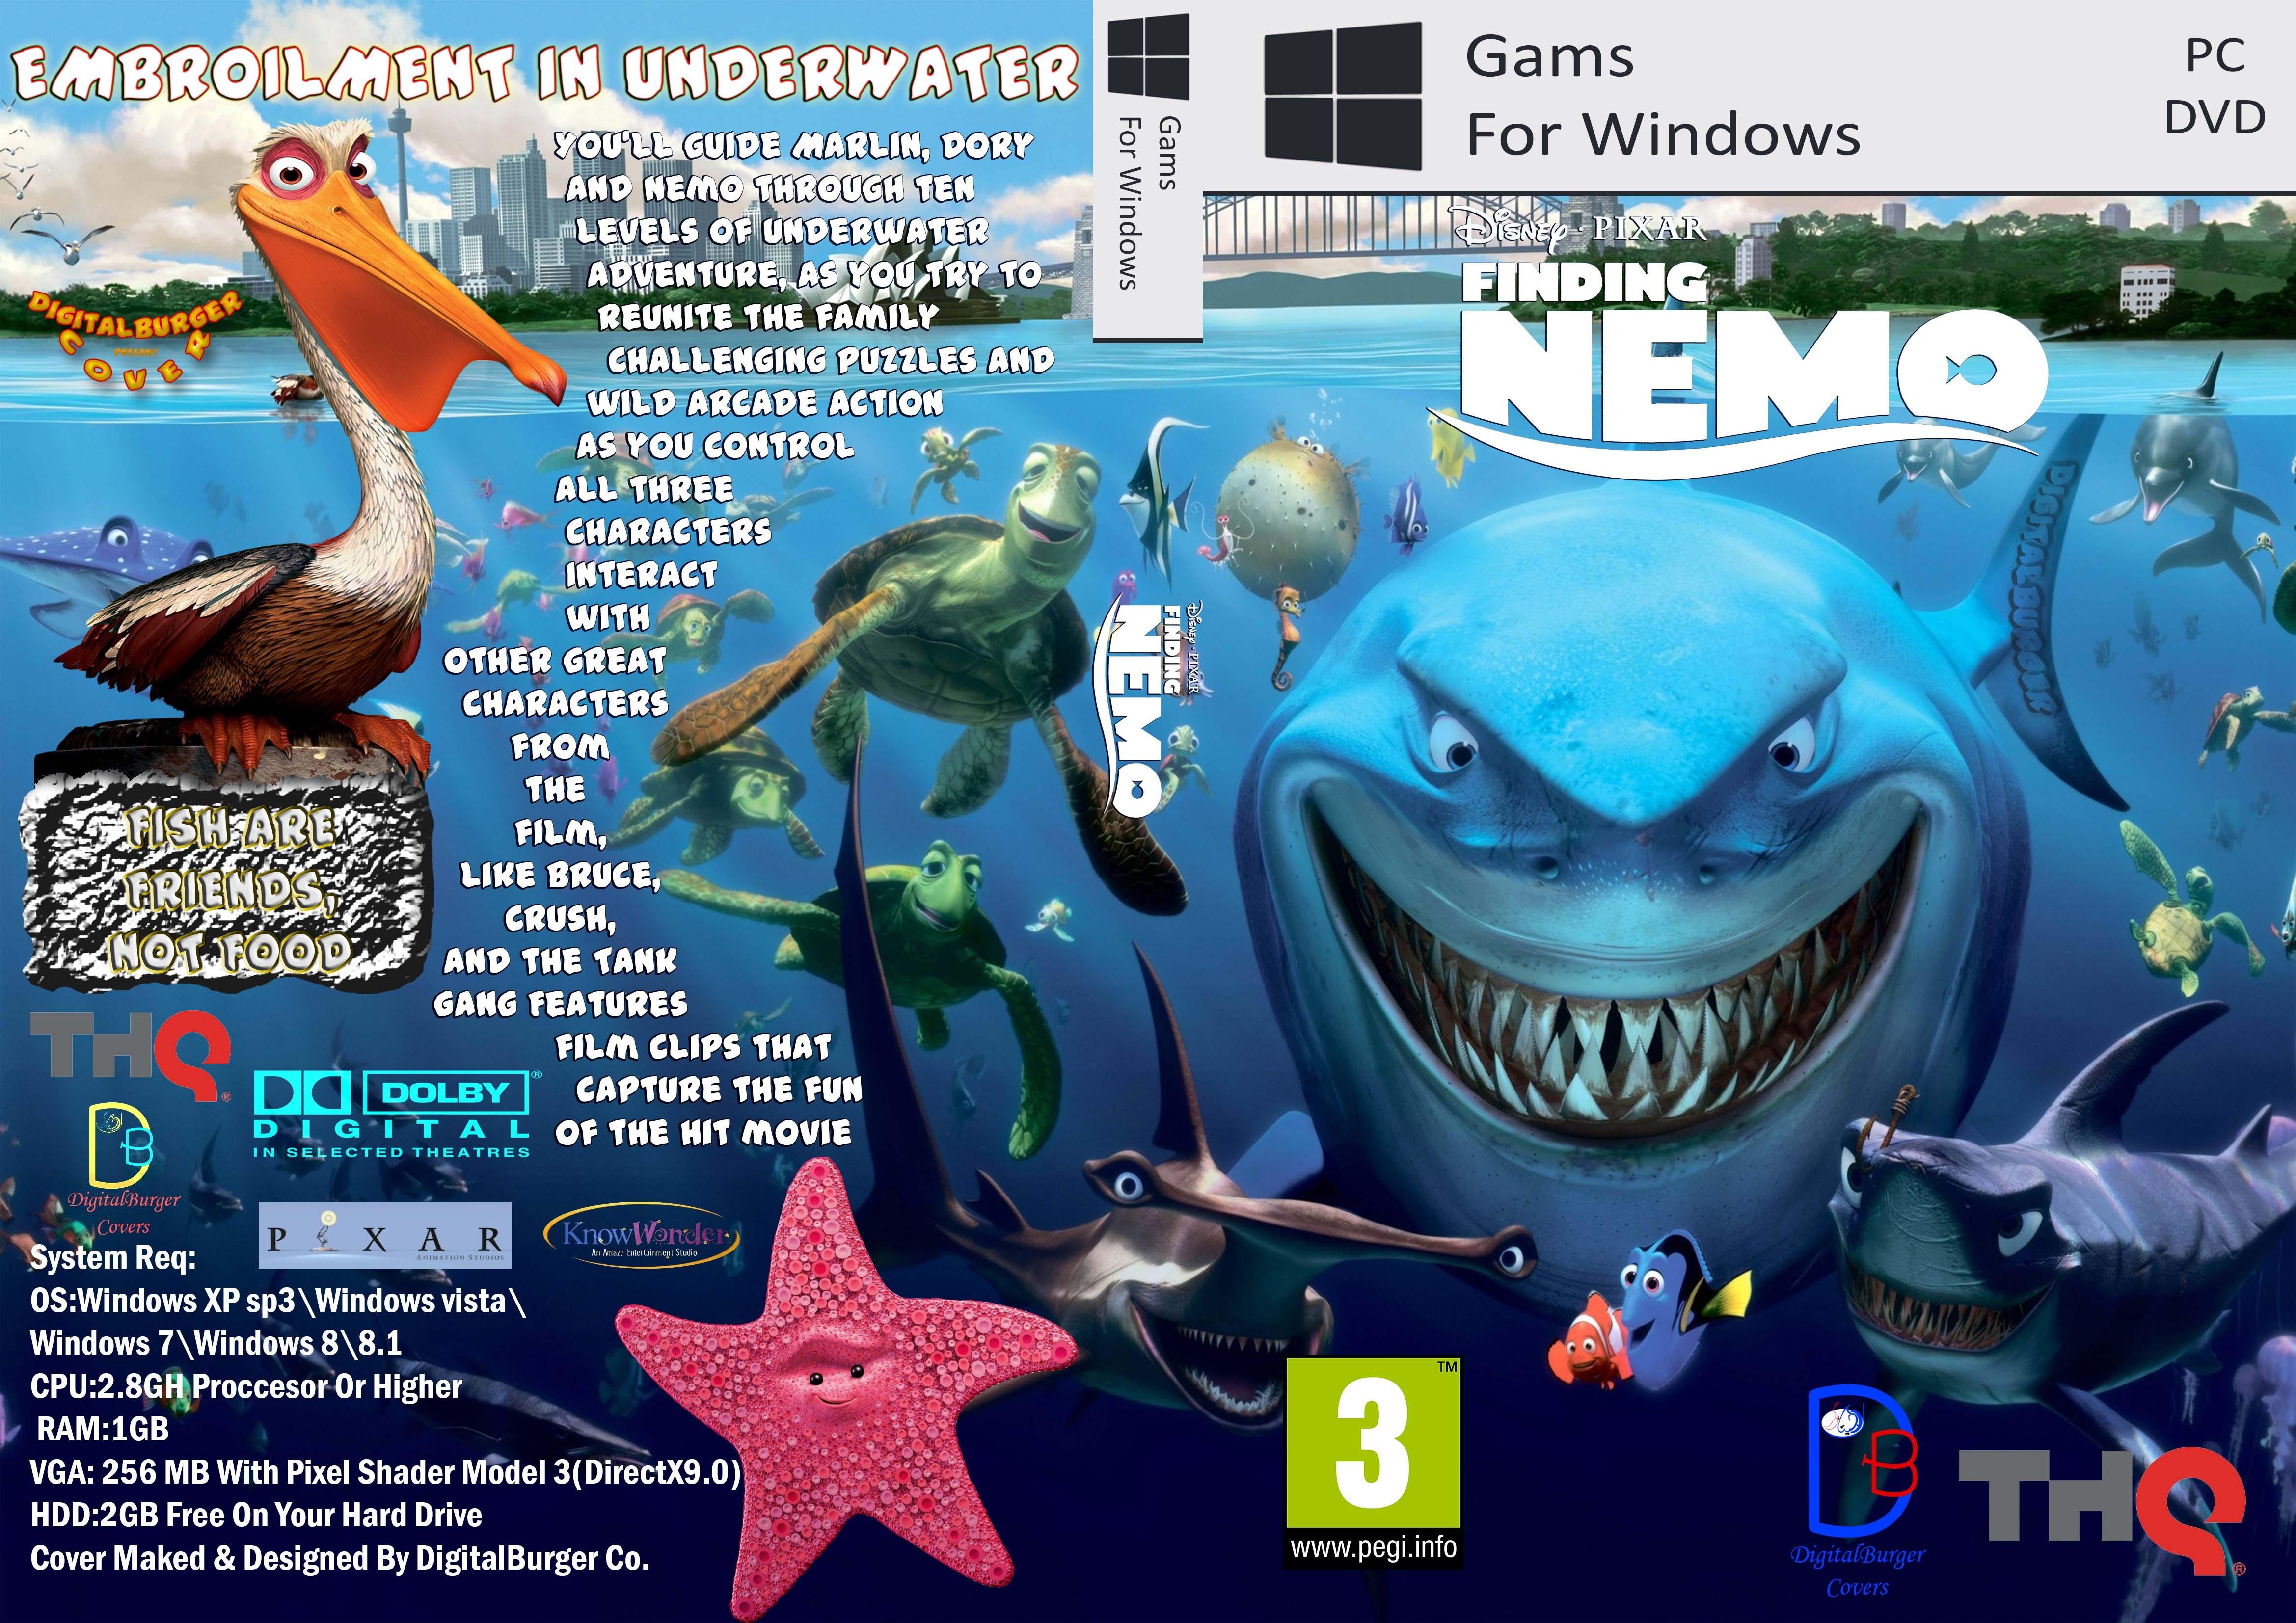 Finding Nemo DB Cover PC Box Art By DigitalBurger